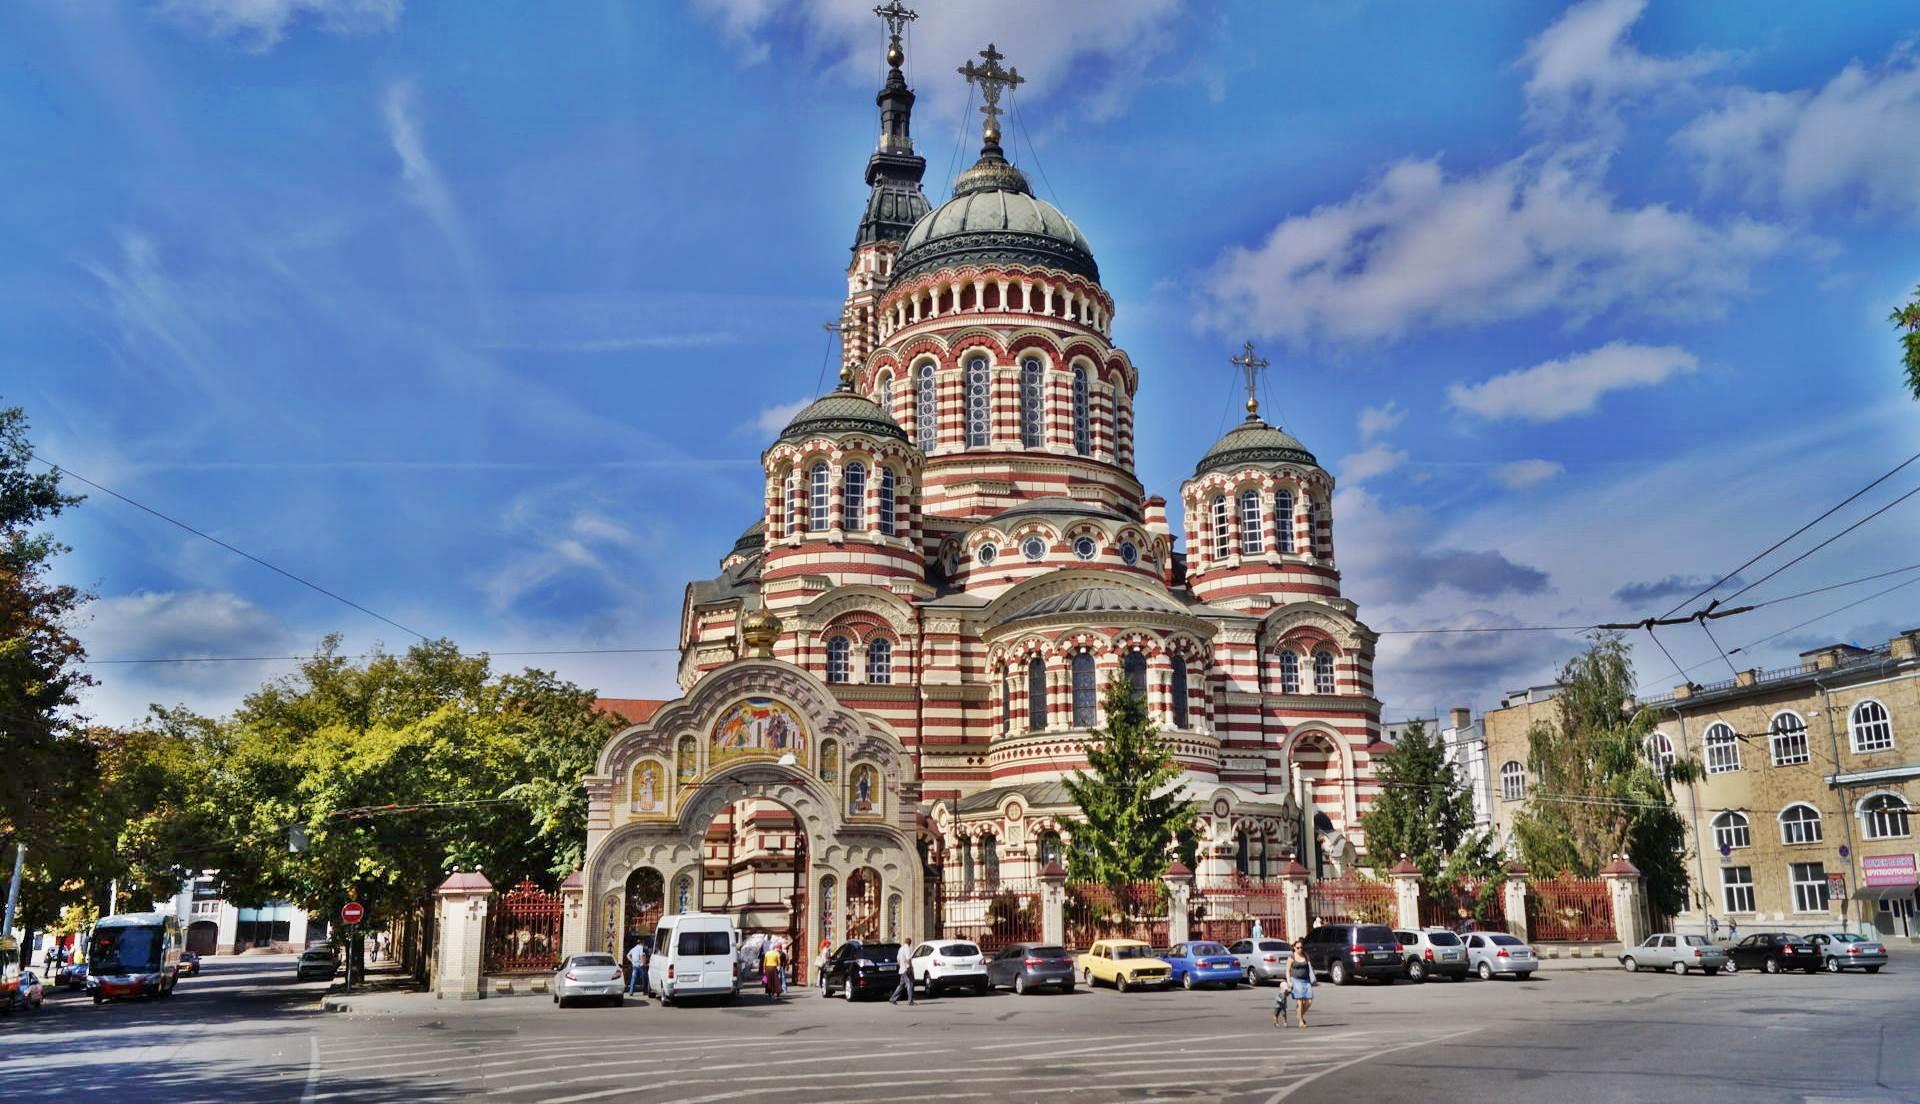 Annunciation Katedrali